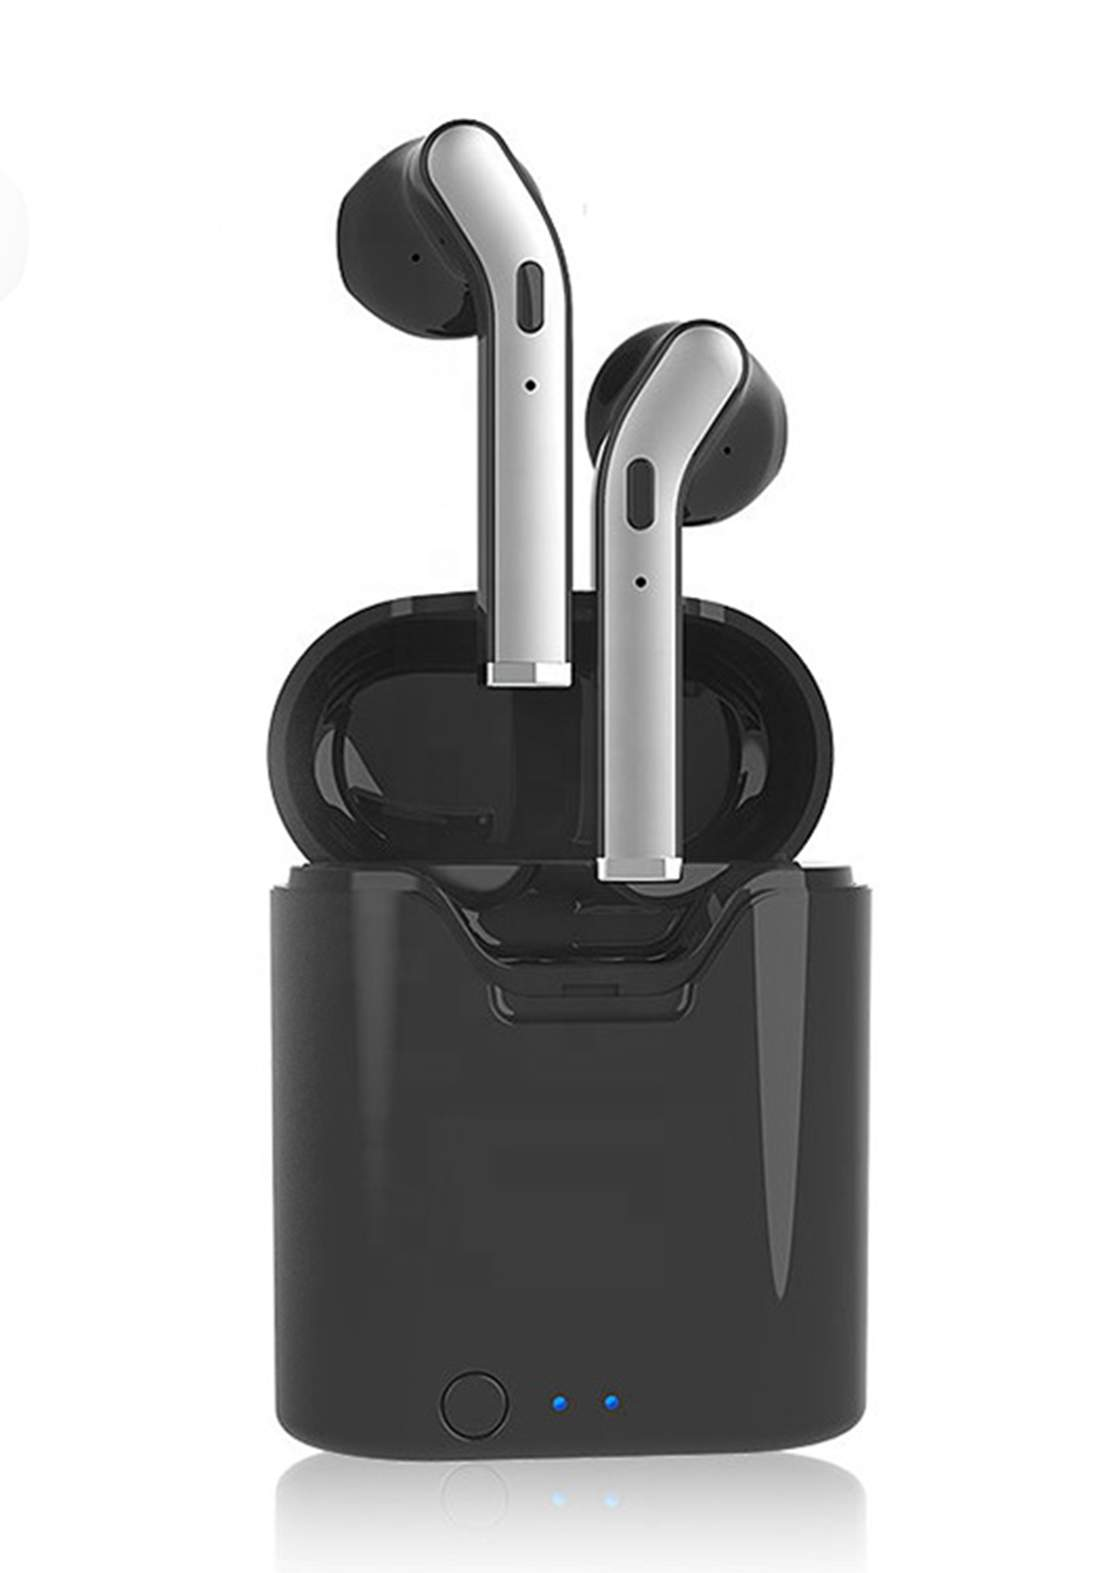 With Charging Box Mini BT 5.0 Sport TWS Earbuds H17T IPX7 Waterproof Wireless Earphone